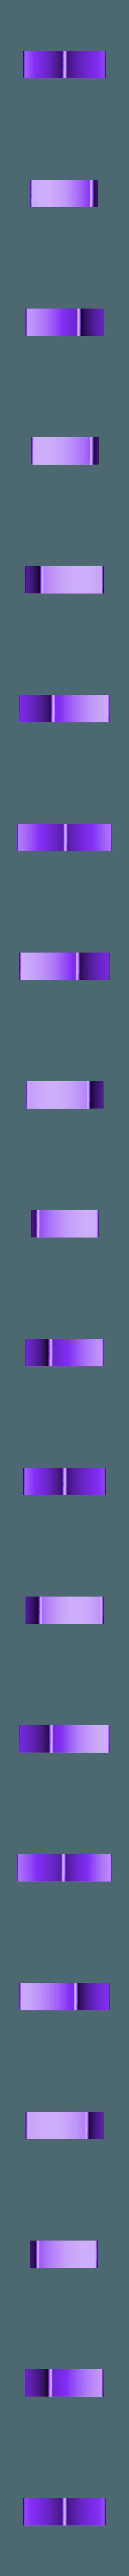 Diamond.stl Download free STL file Cards Cookie Cutters (4 Pack) • 3D print design, Jdog